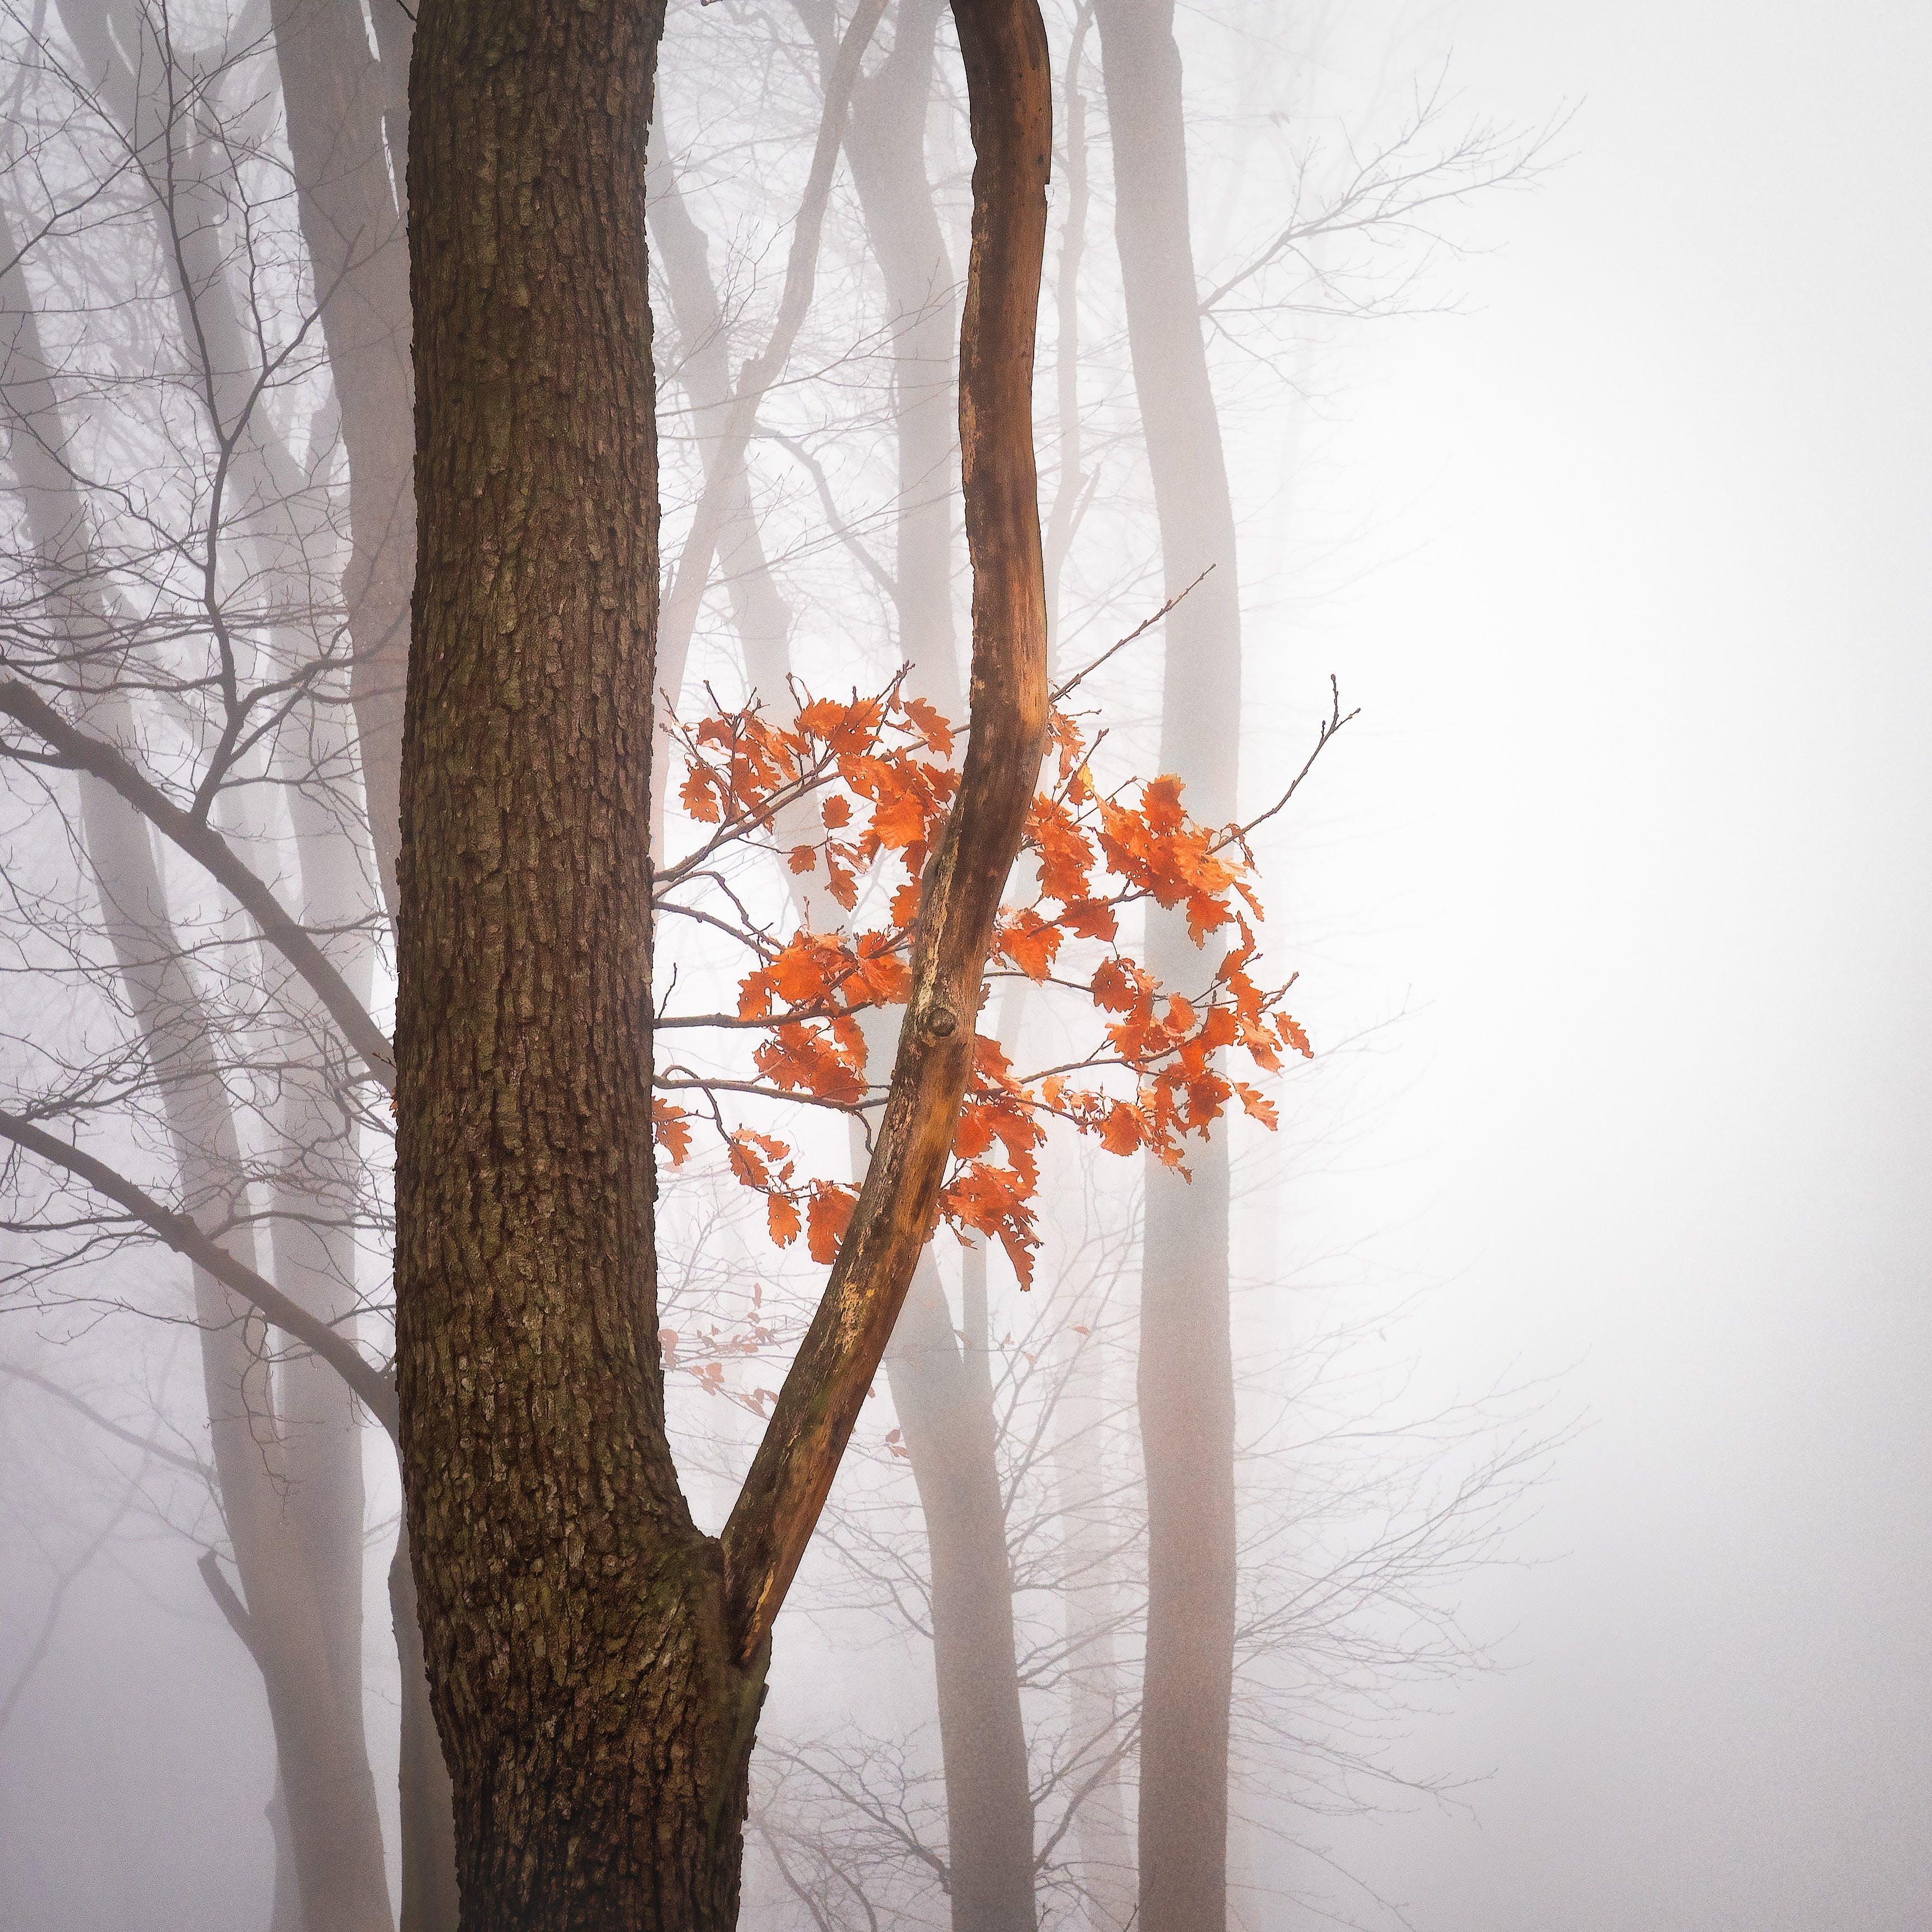 Free stock photo of colors of autumn, fog, foliage, orange